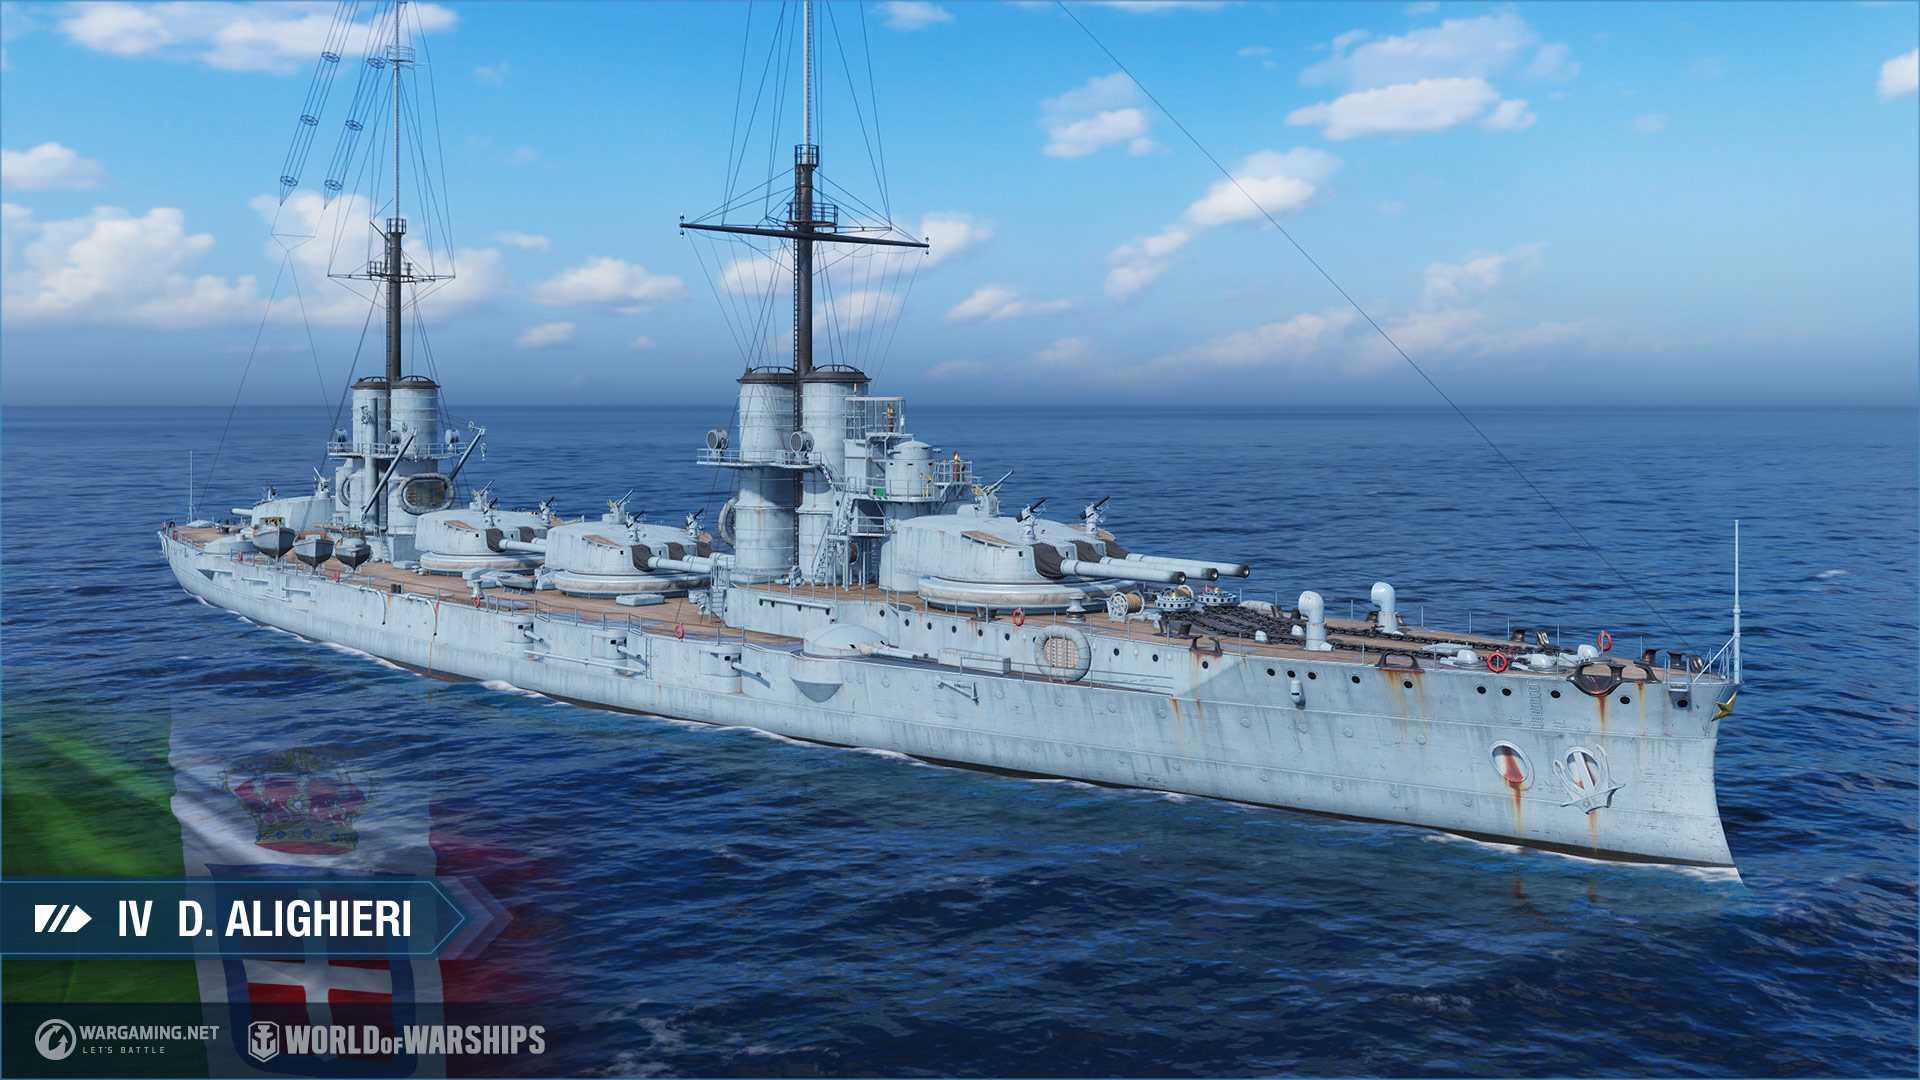 World of Warships Update 0.10.3 - D. Aligiheri